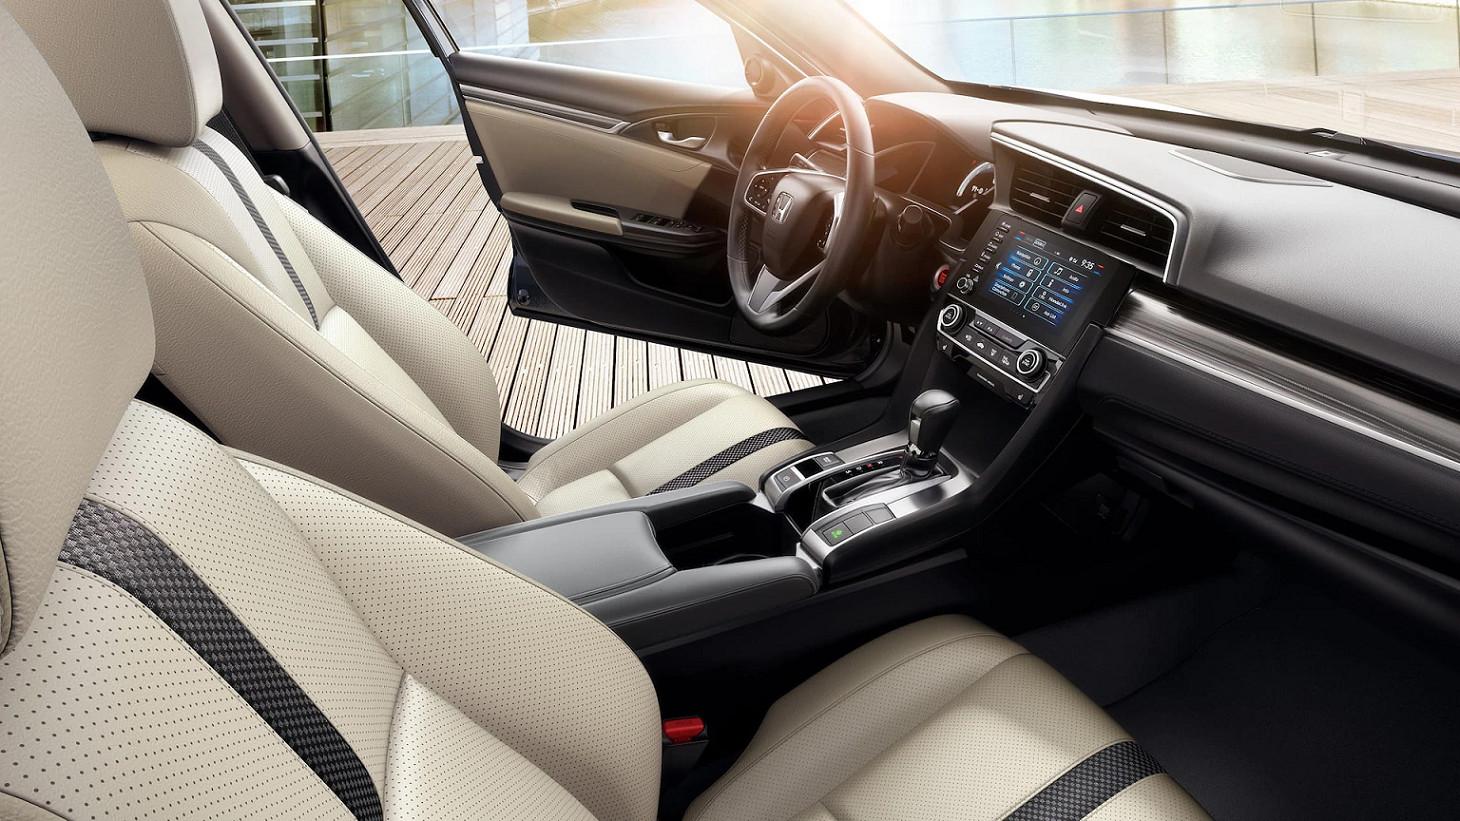 Cozy Amenities in the 2020 Honda Civic